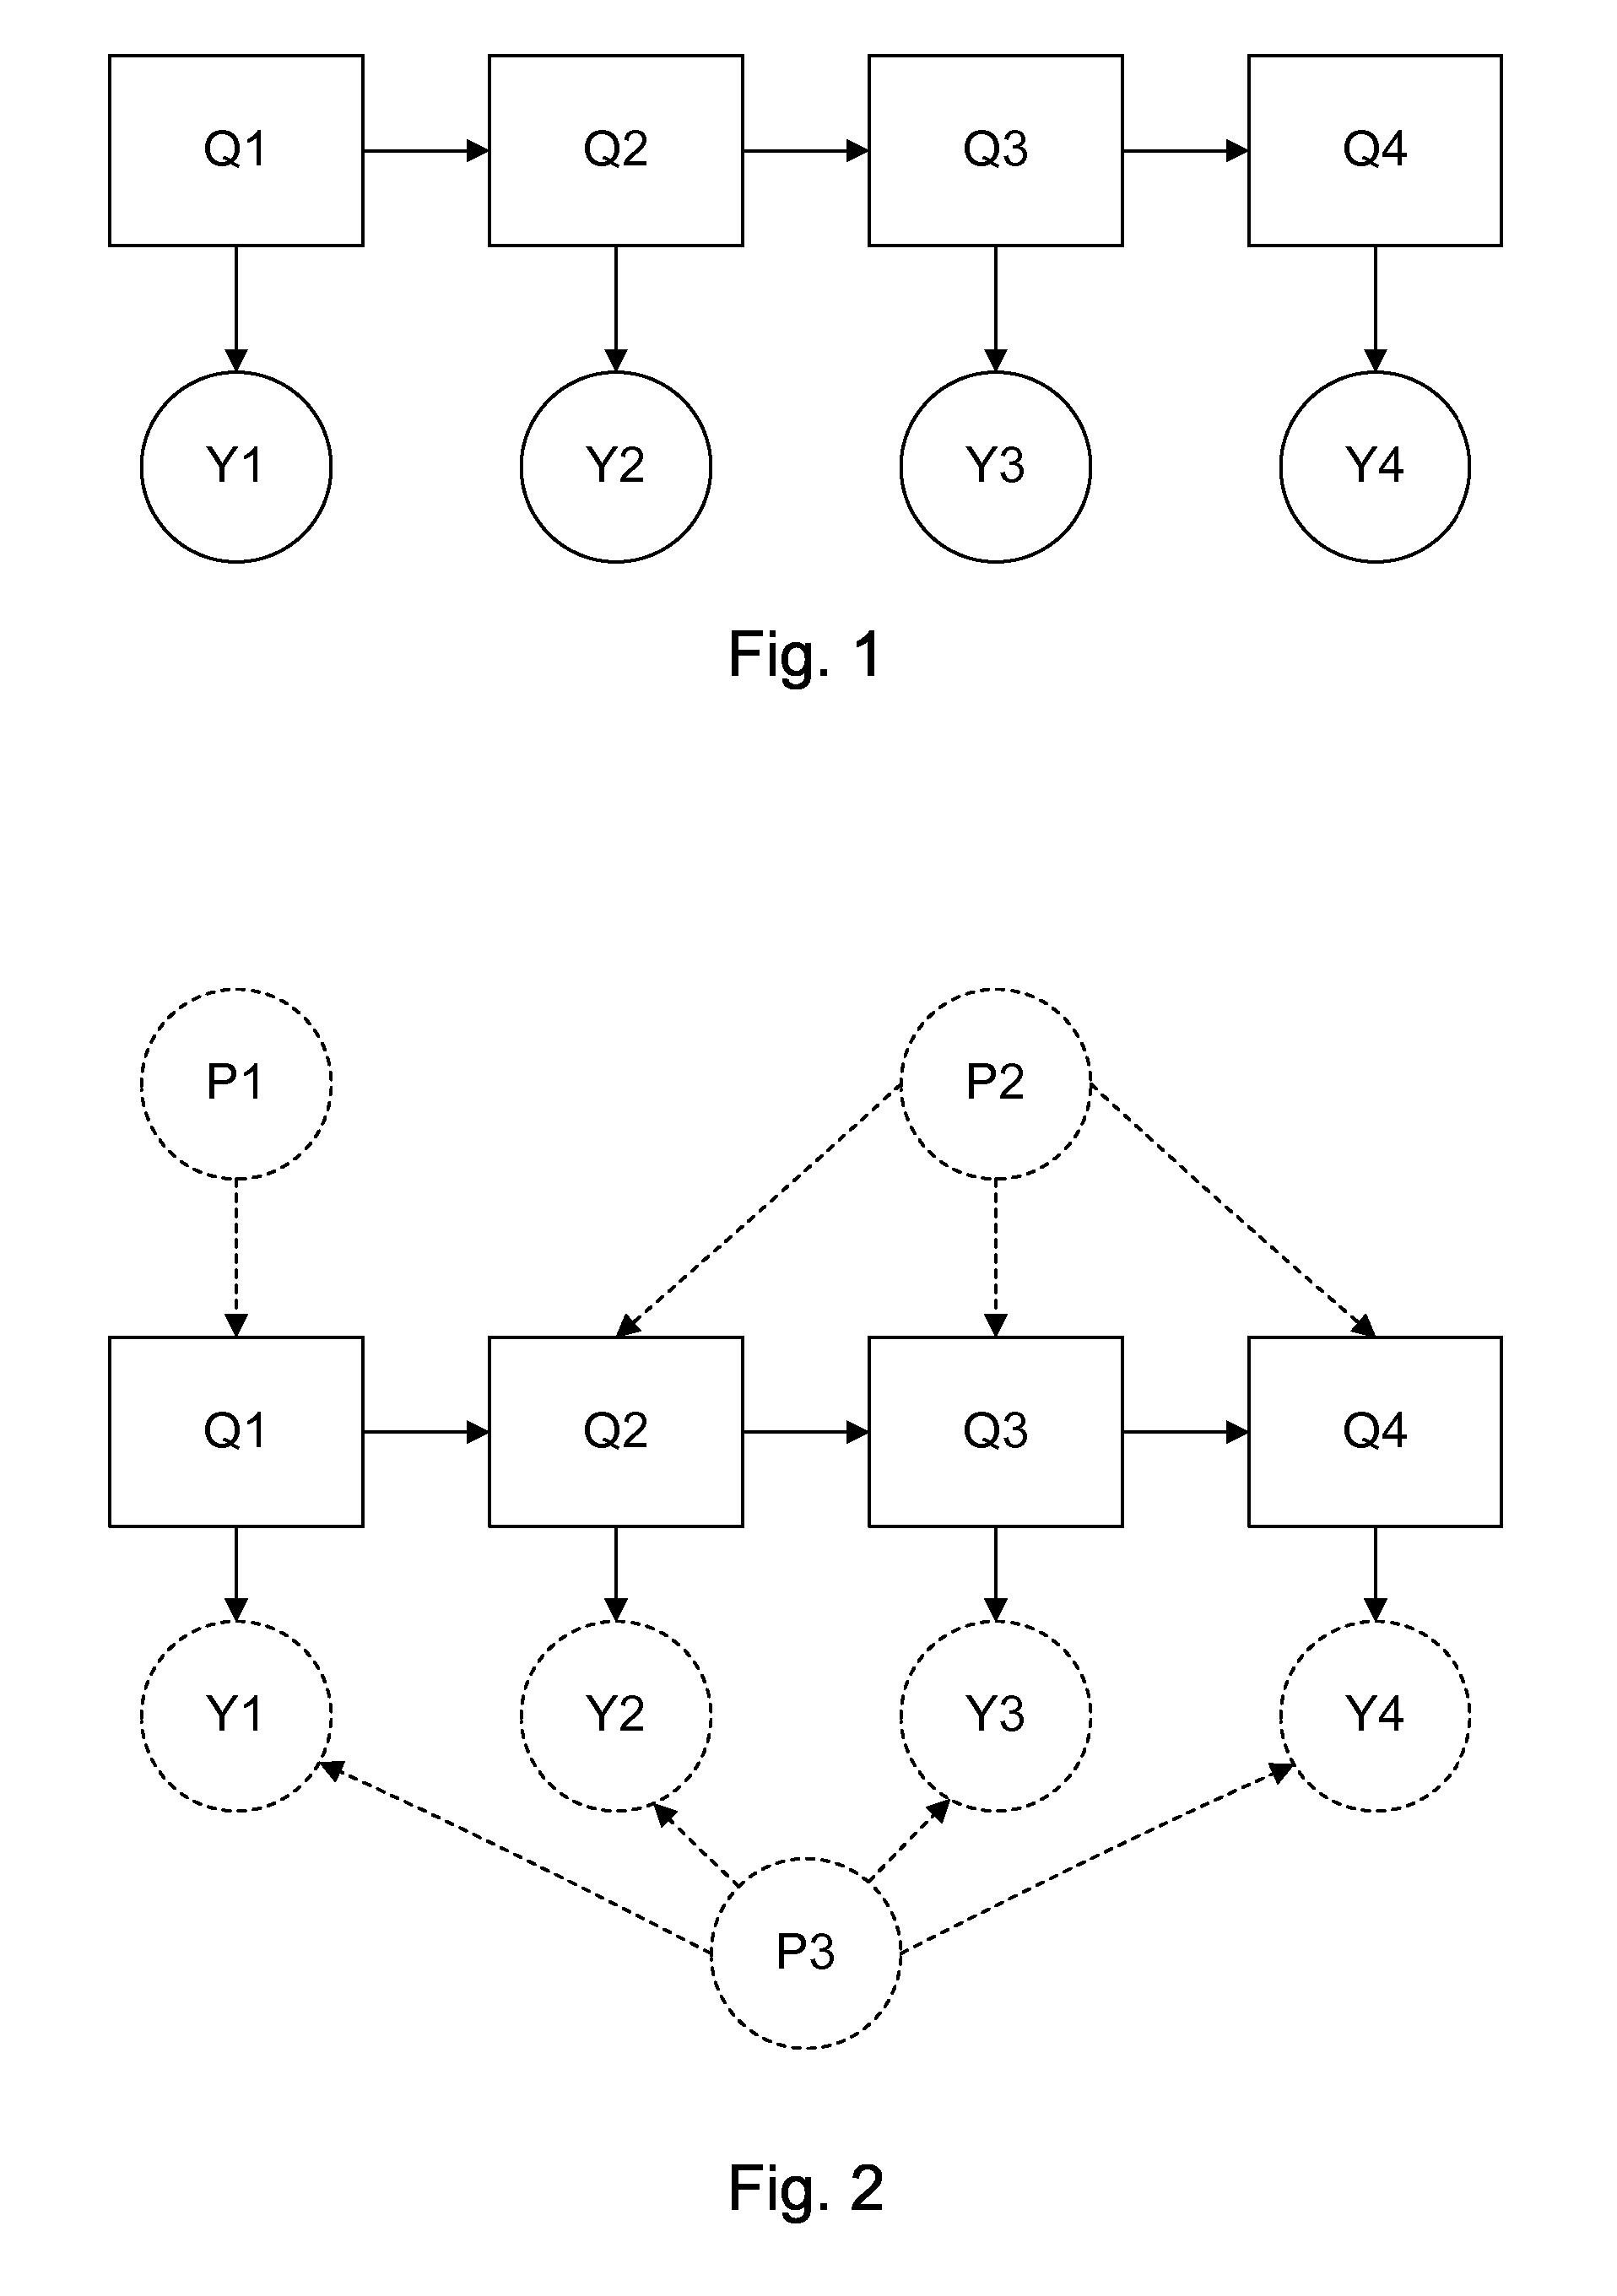 Patent Us 20070087756a1 600 X 540 45 Kb Jpeg Simple Flashing Led Circuit Images